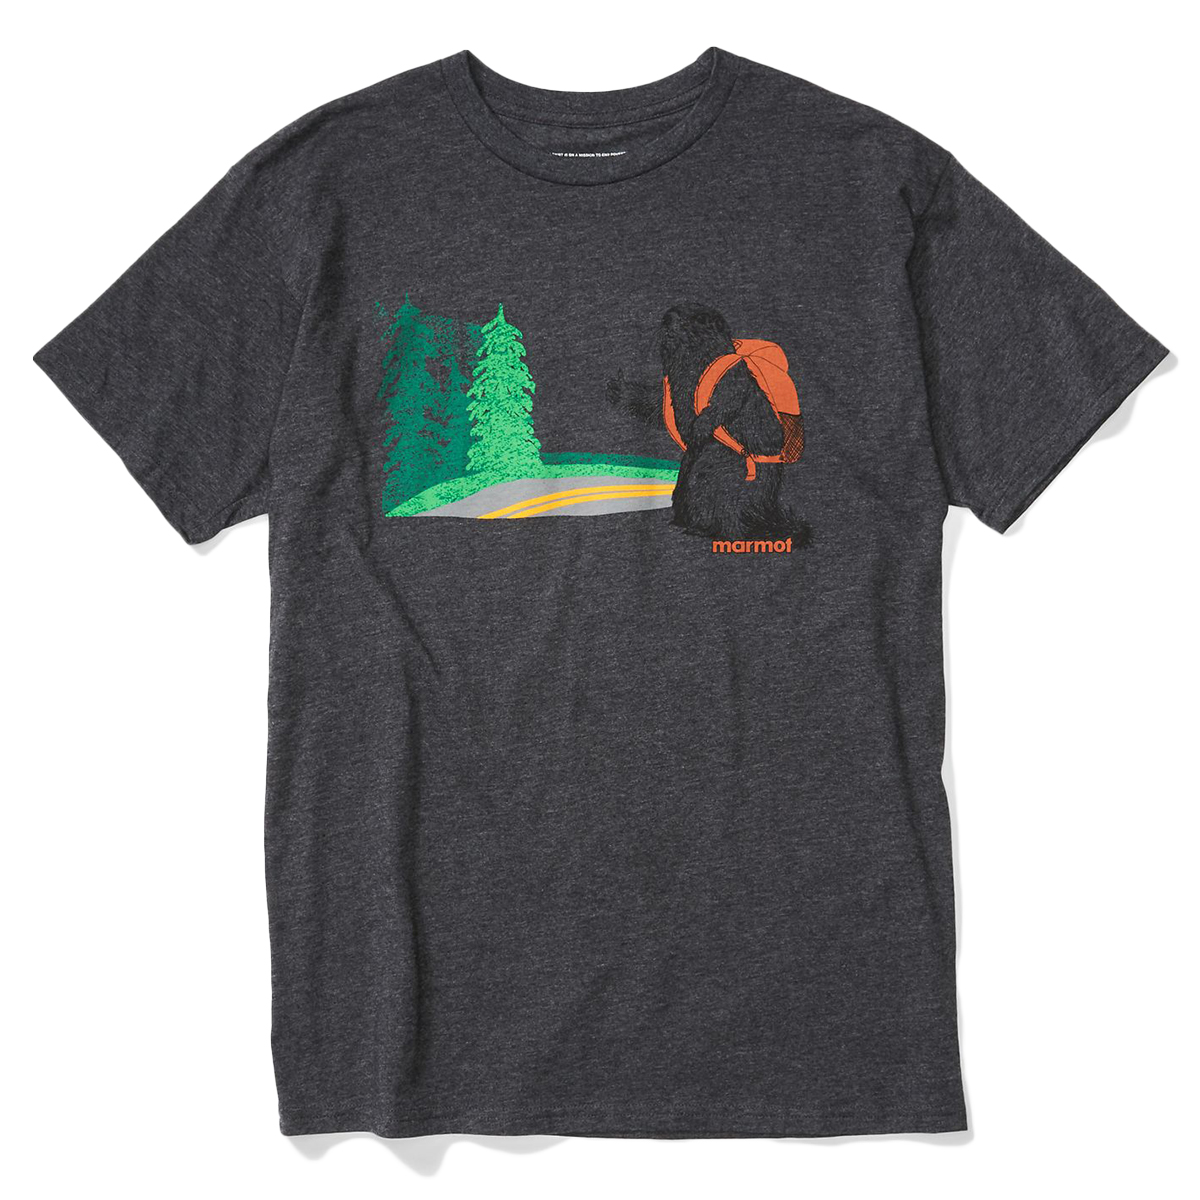 Marmot Men's Trek Short-Sleeve Tee - Black, L